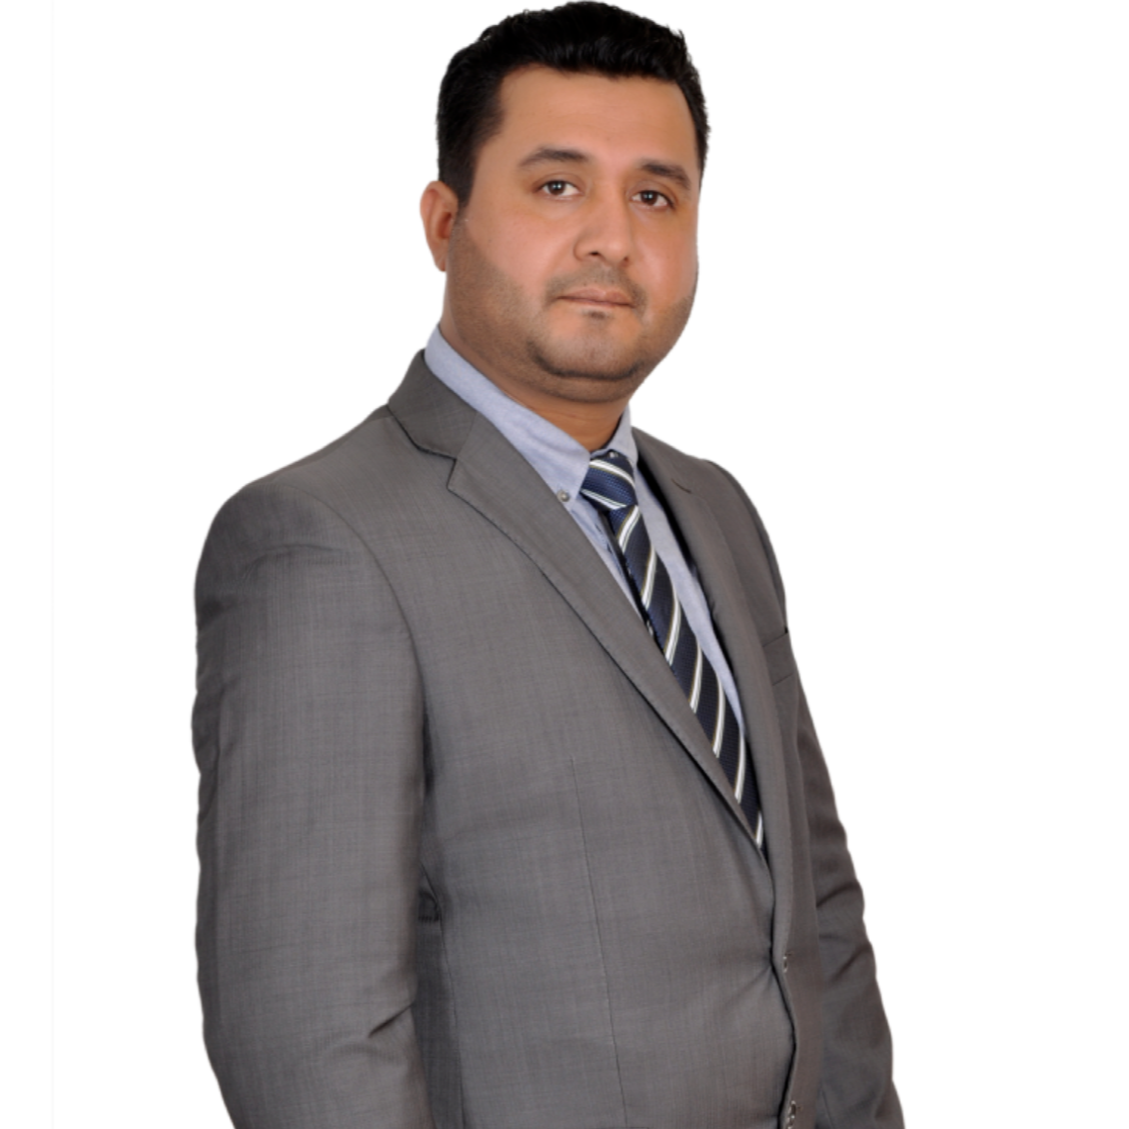 Muhammad Zia Naseem